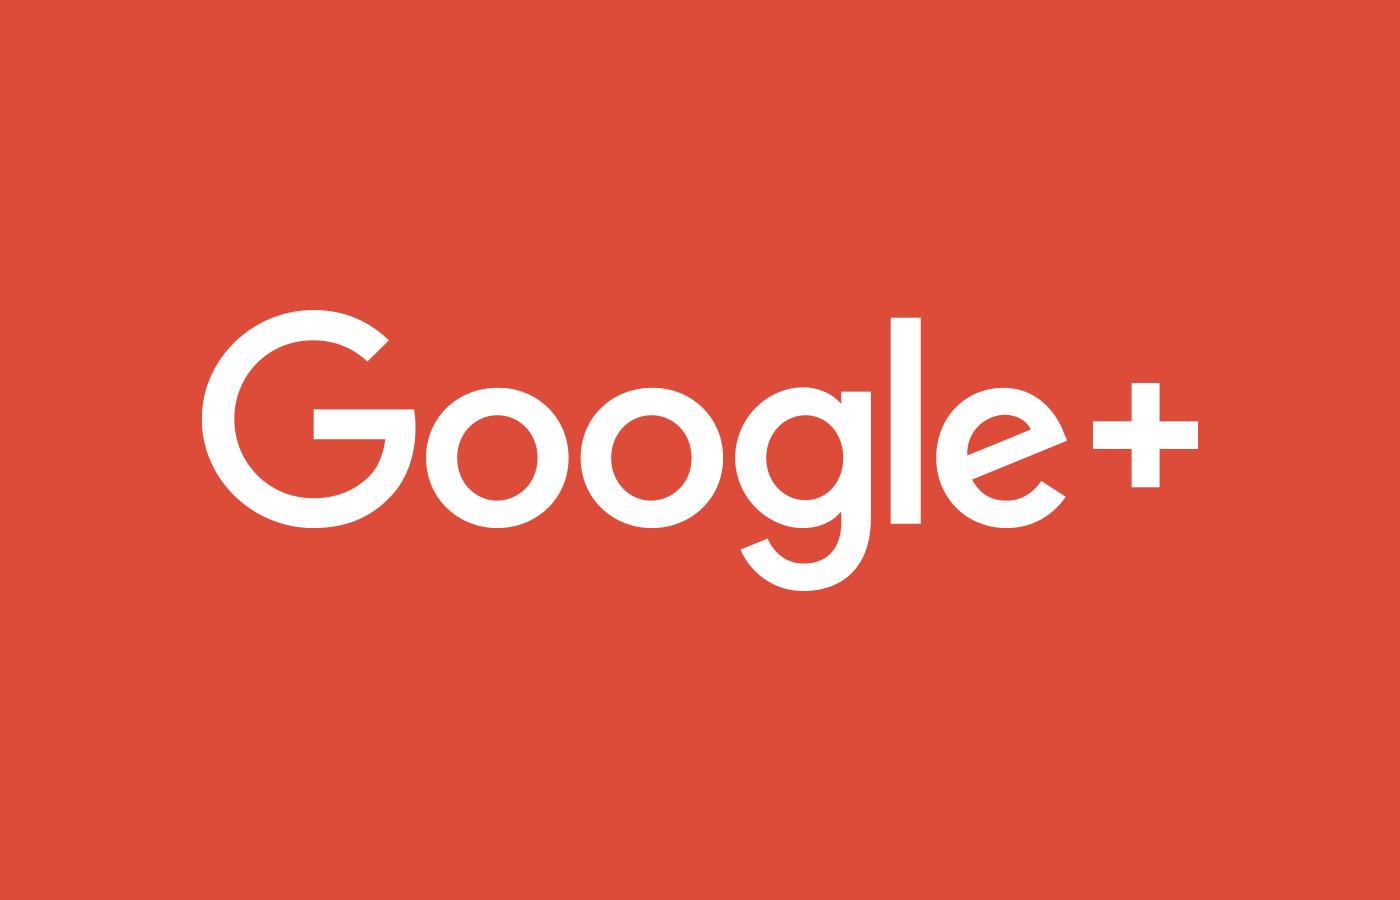 google plus google+